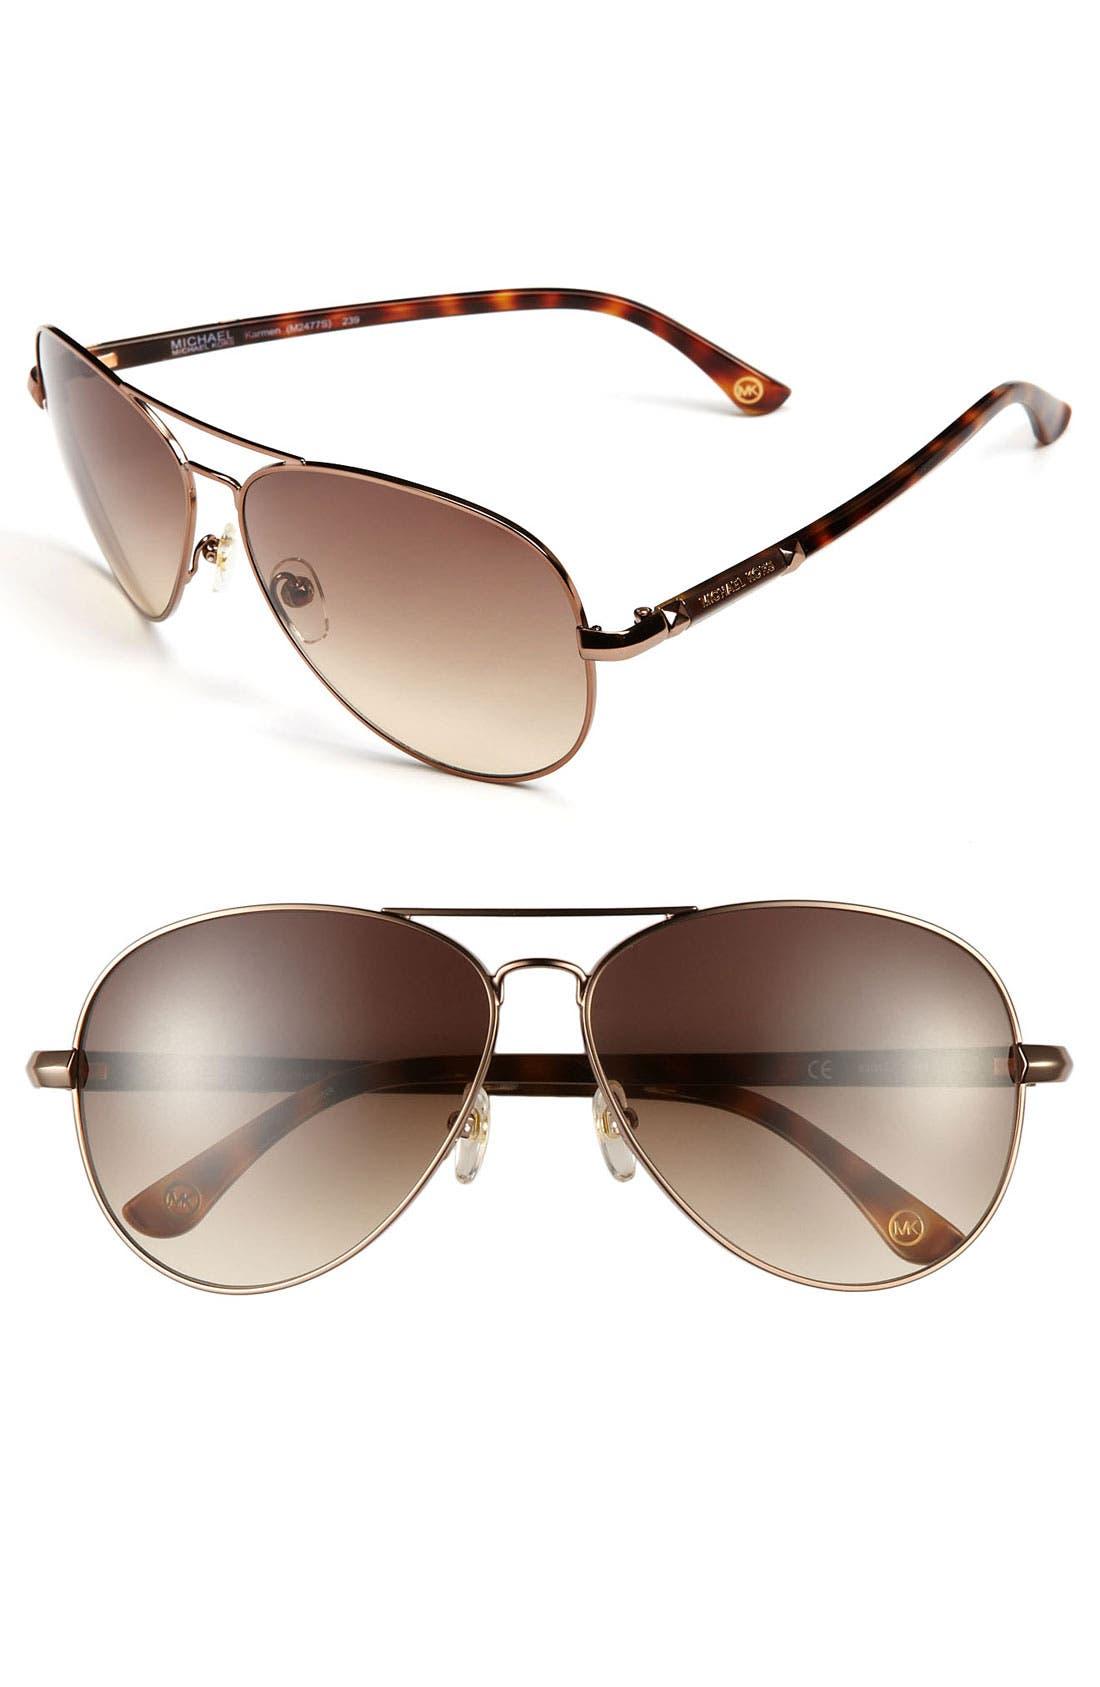 62mm Metal Aviator Sunglasses,                             Main thumbnail 3, color,